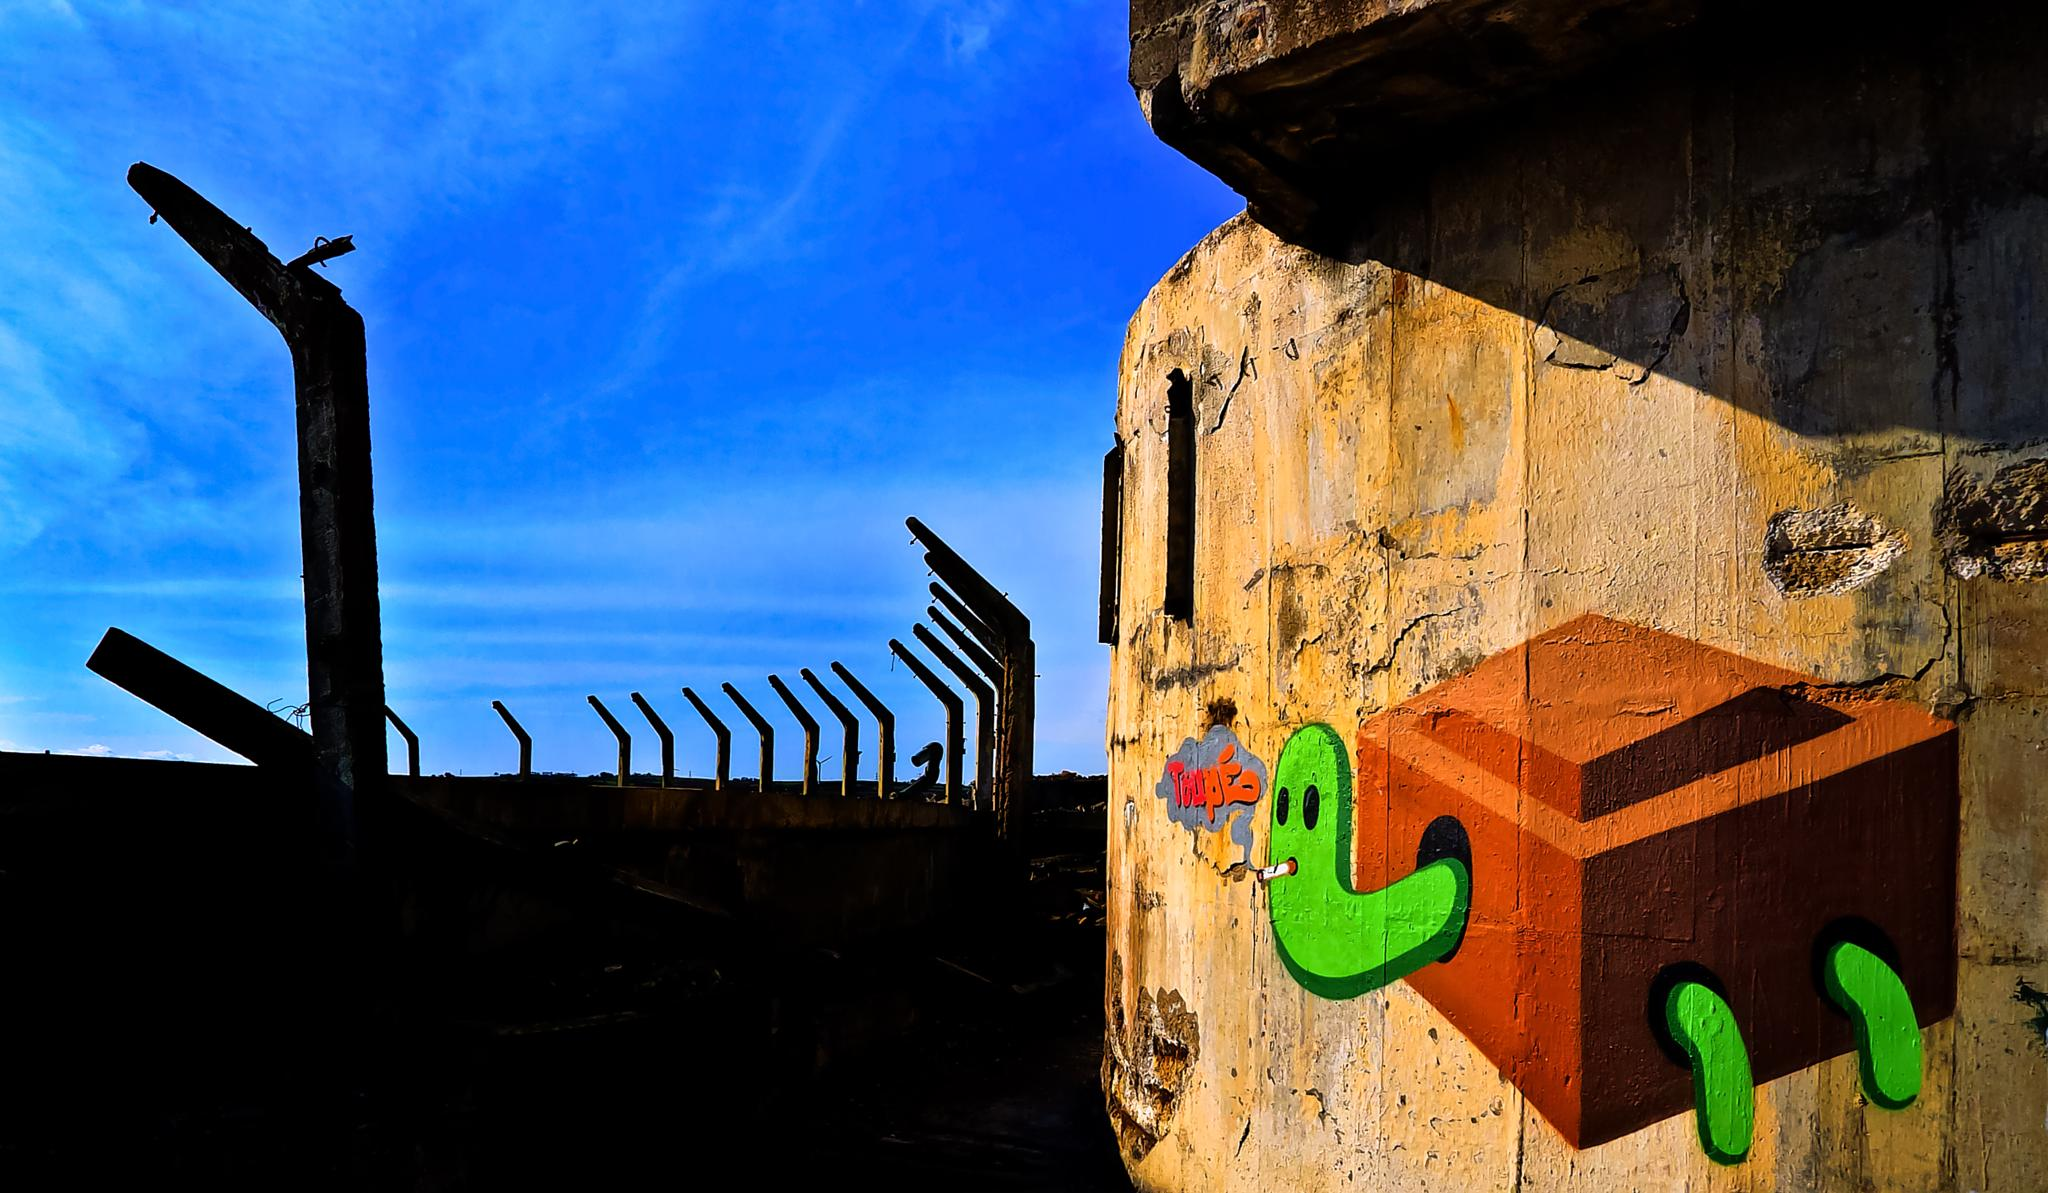 graffitti by Peter Edwardo Vicente.